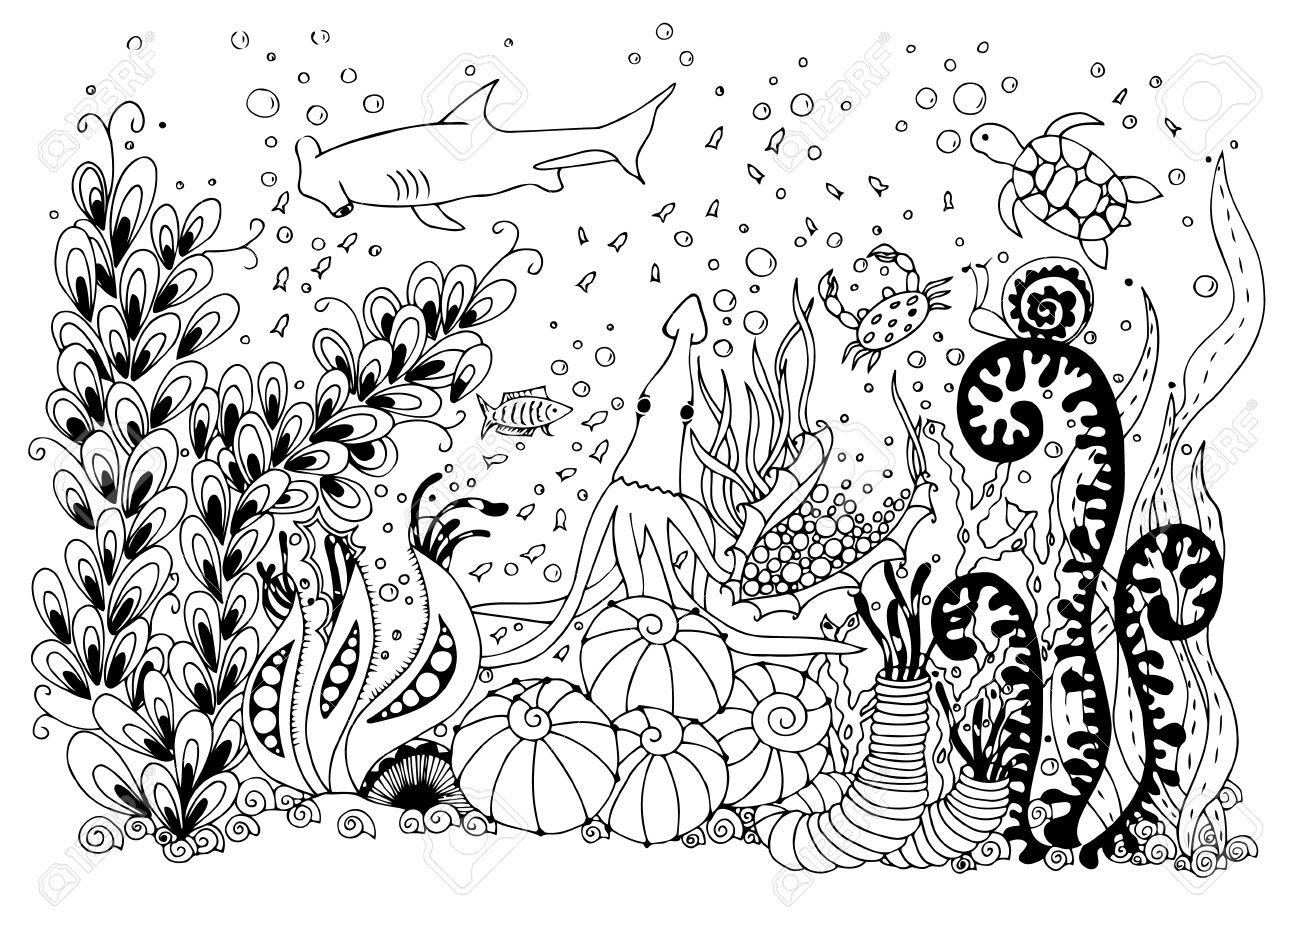 Illustration Underwater World Doodle Sea Ocean Fairy Story A Treasure Chest Adventure